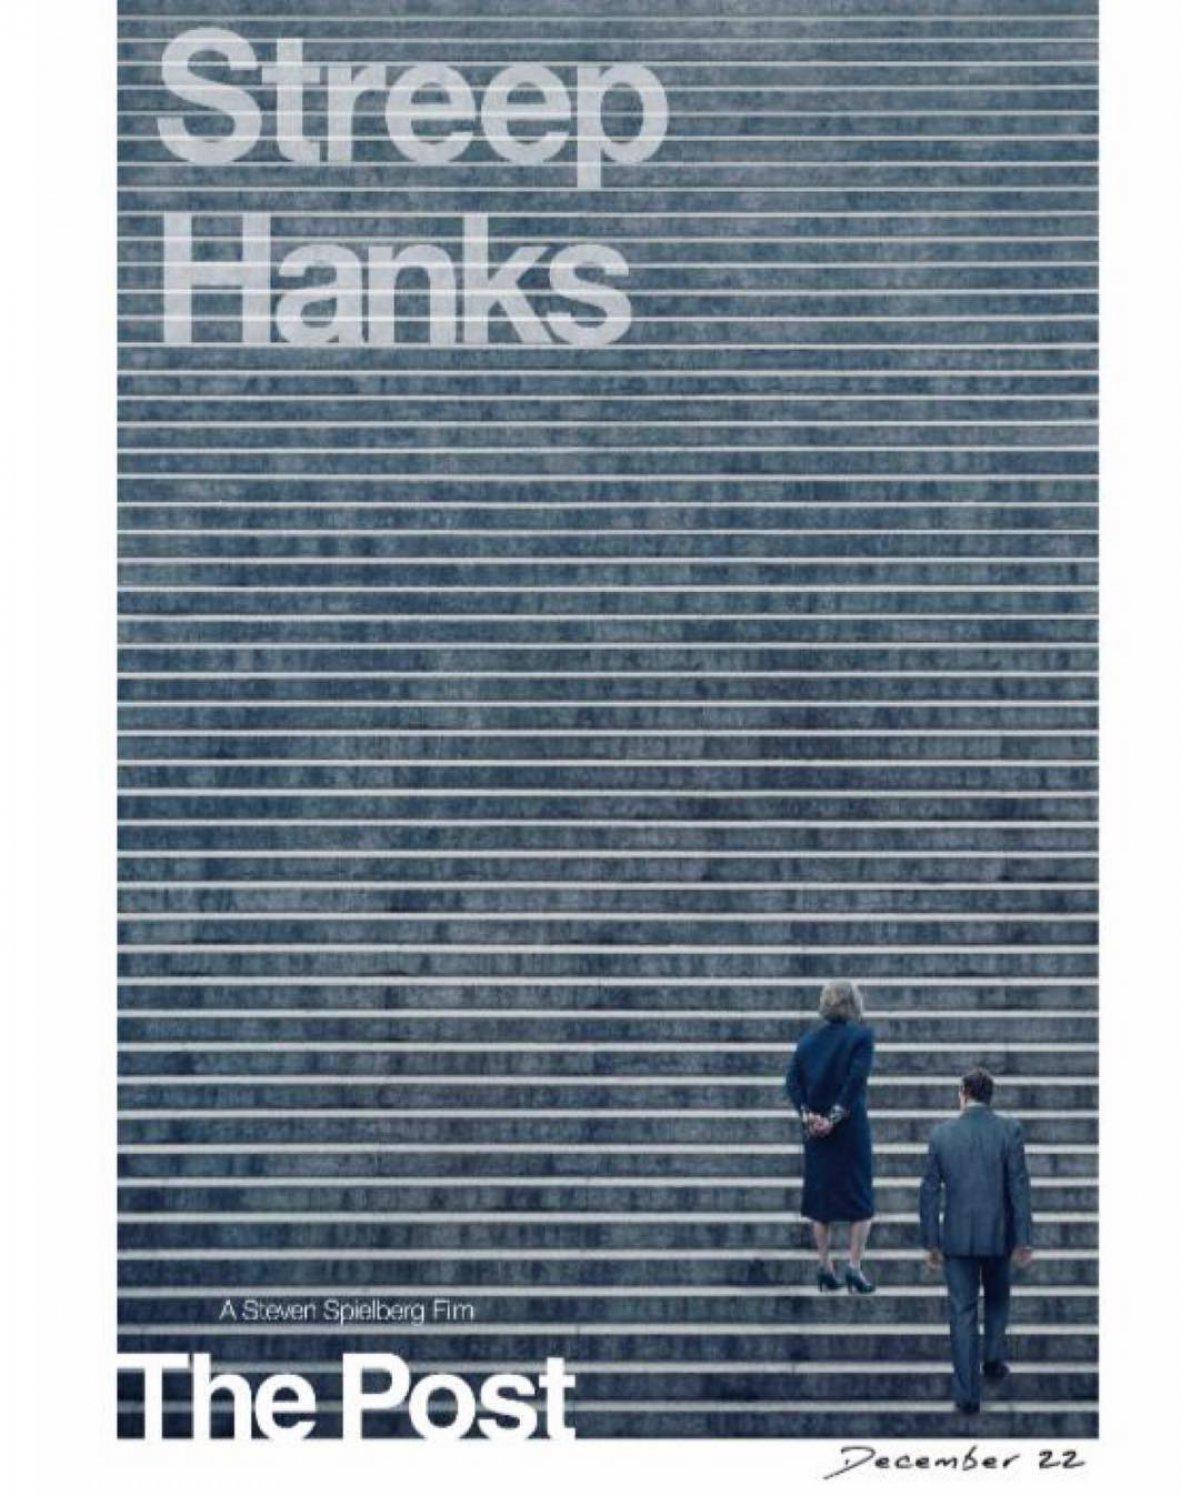 Tom hanks and meryl streep star in first trailer for steven the post nvjuhfo Choice Image